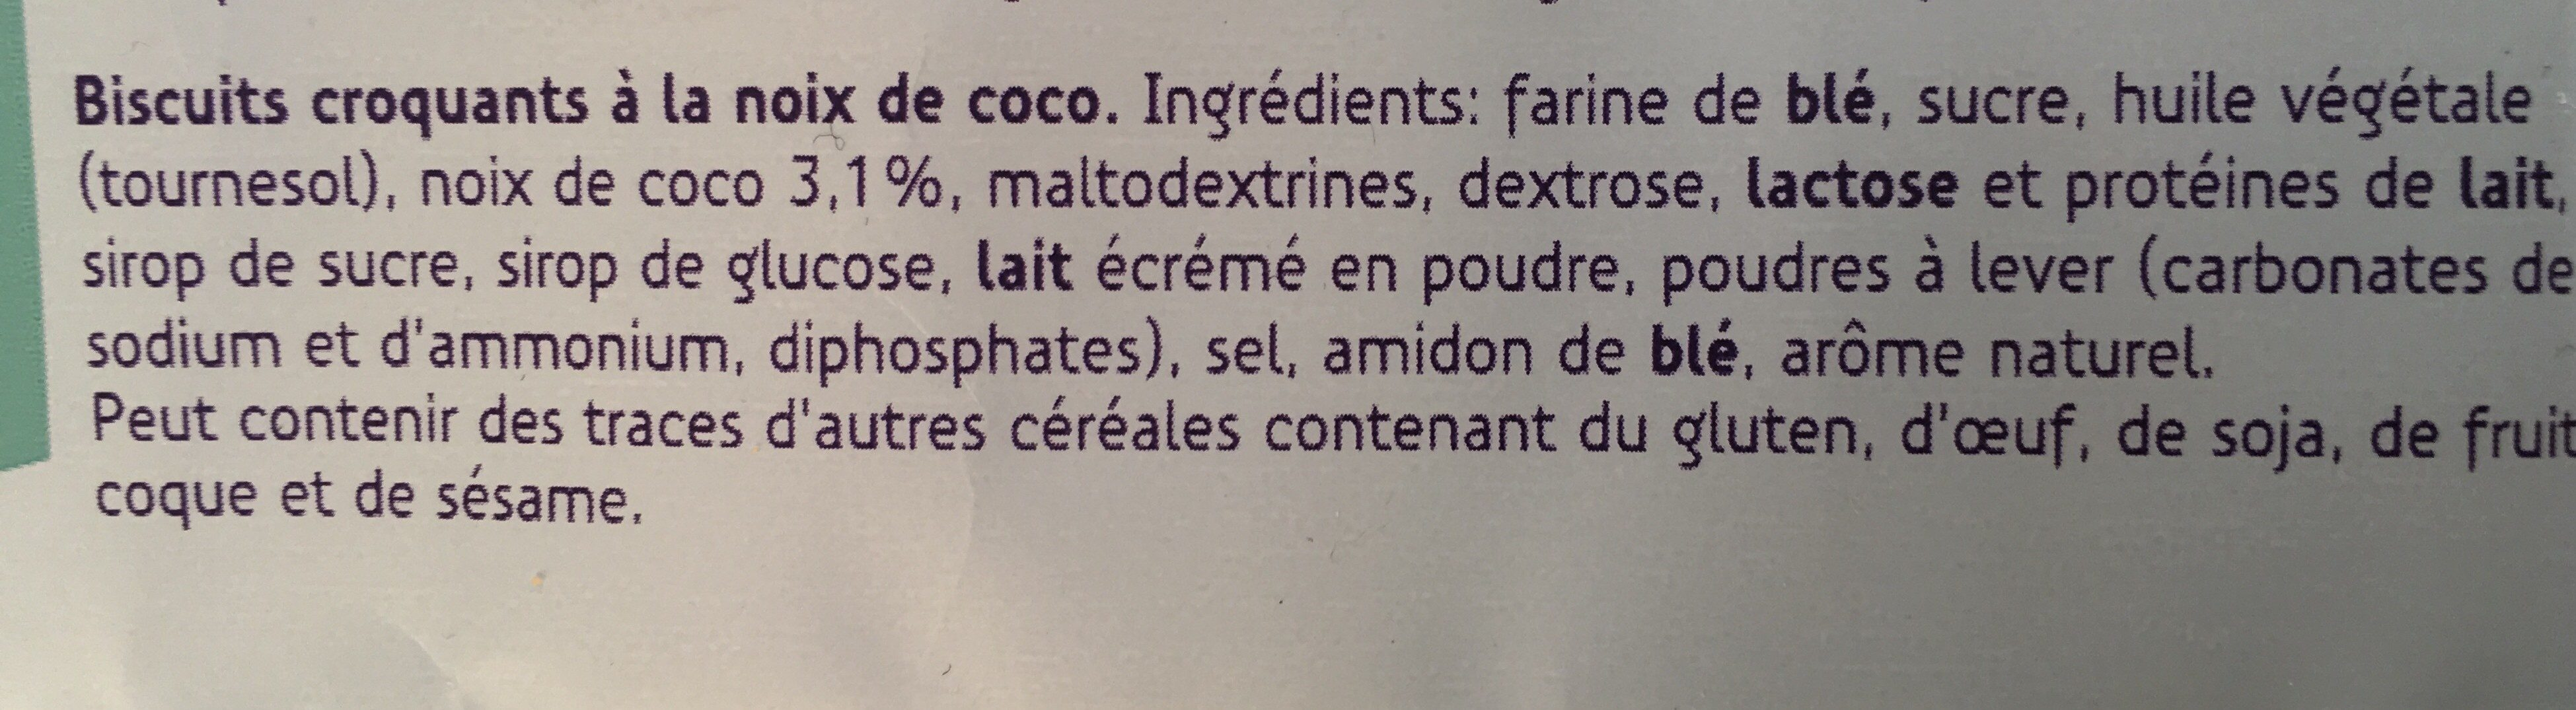 Biscuits Croquants Coco - Ingrédients - fr